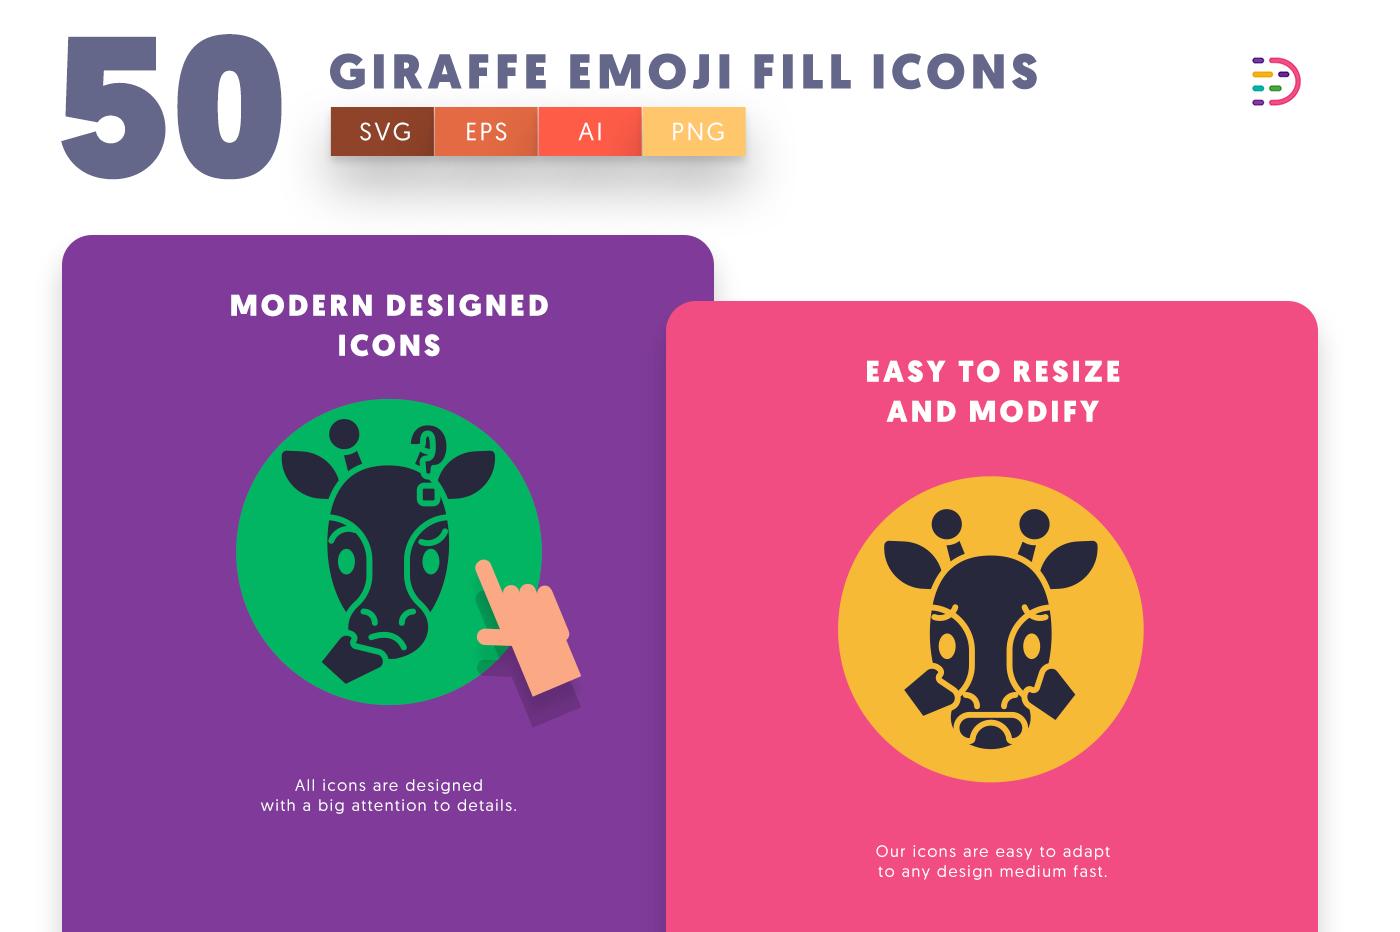 Giraffe Emoji Fill icons png/svg/eps